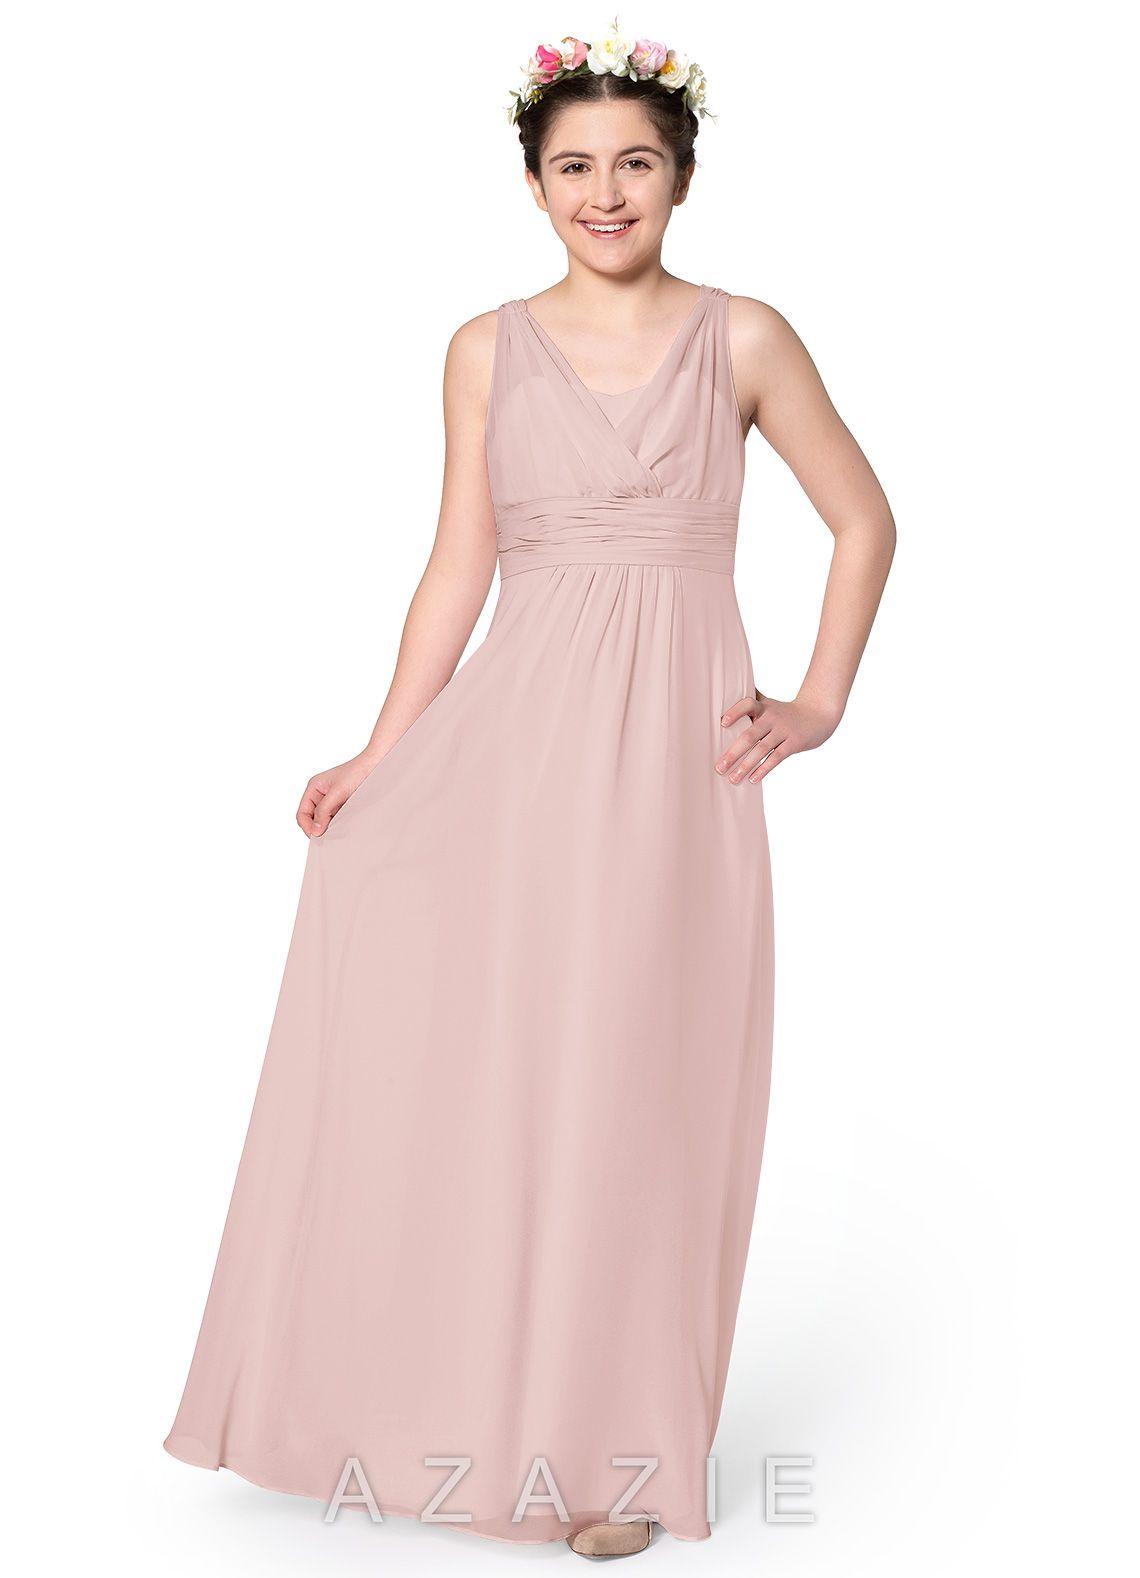 cedea96db Azazie Sophia JBD Junior Bridesmaid Dress | Azazie